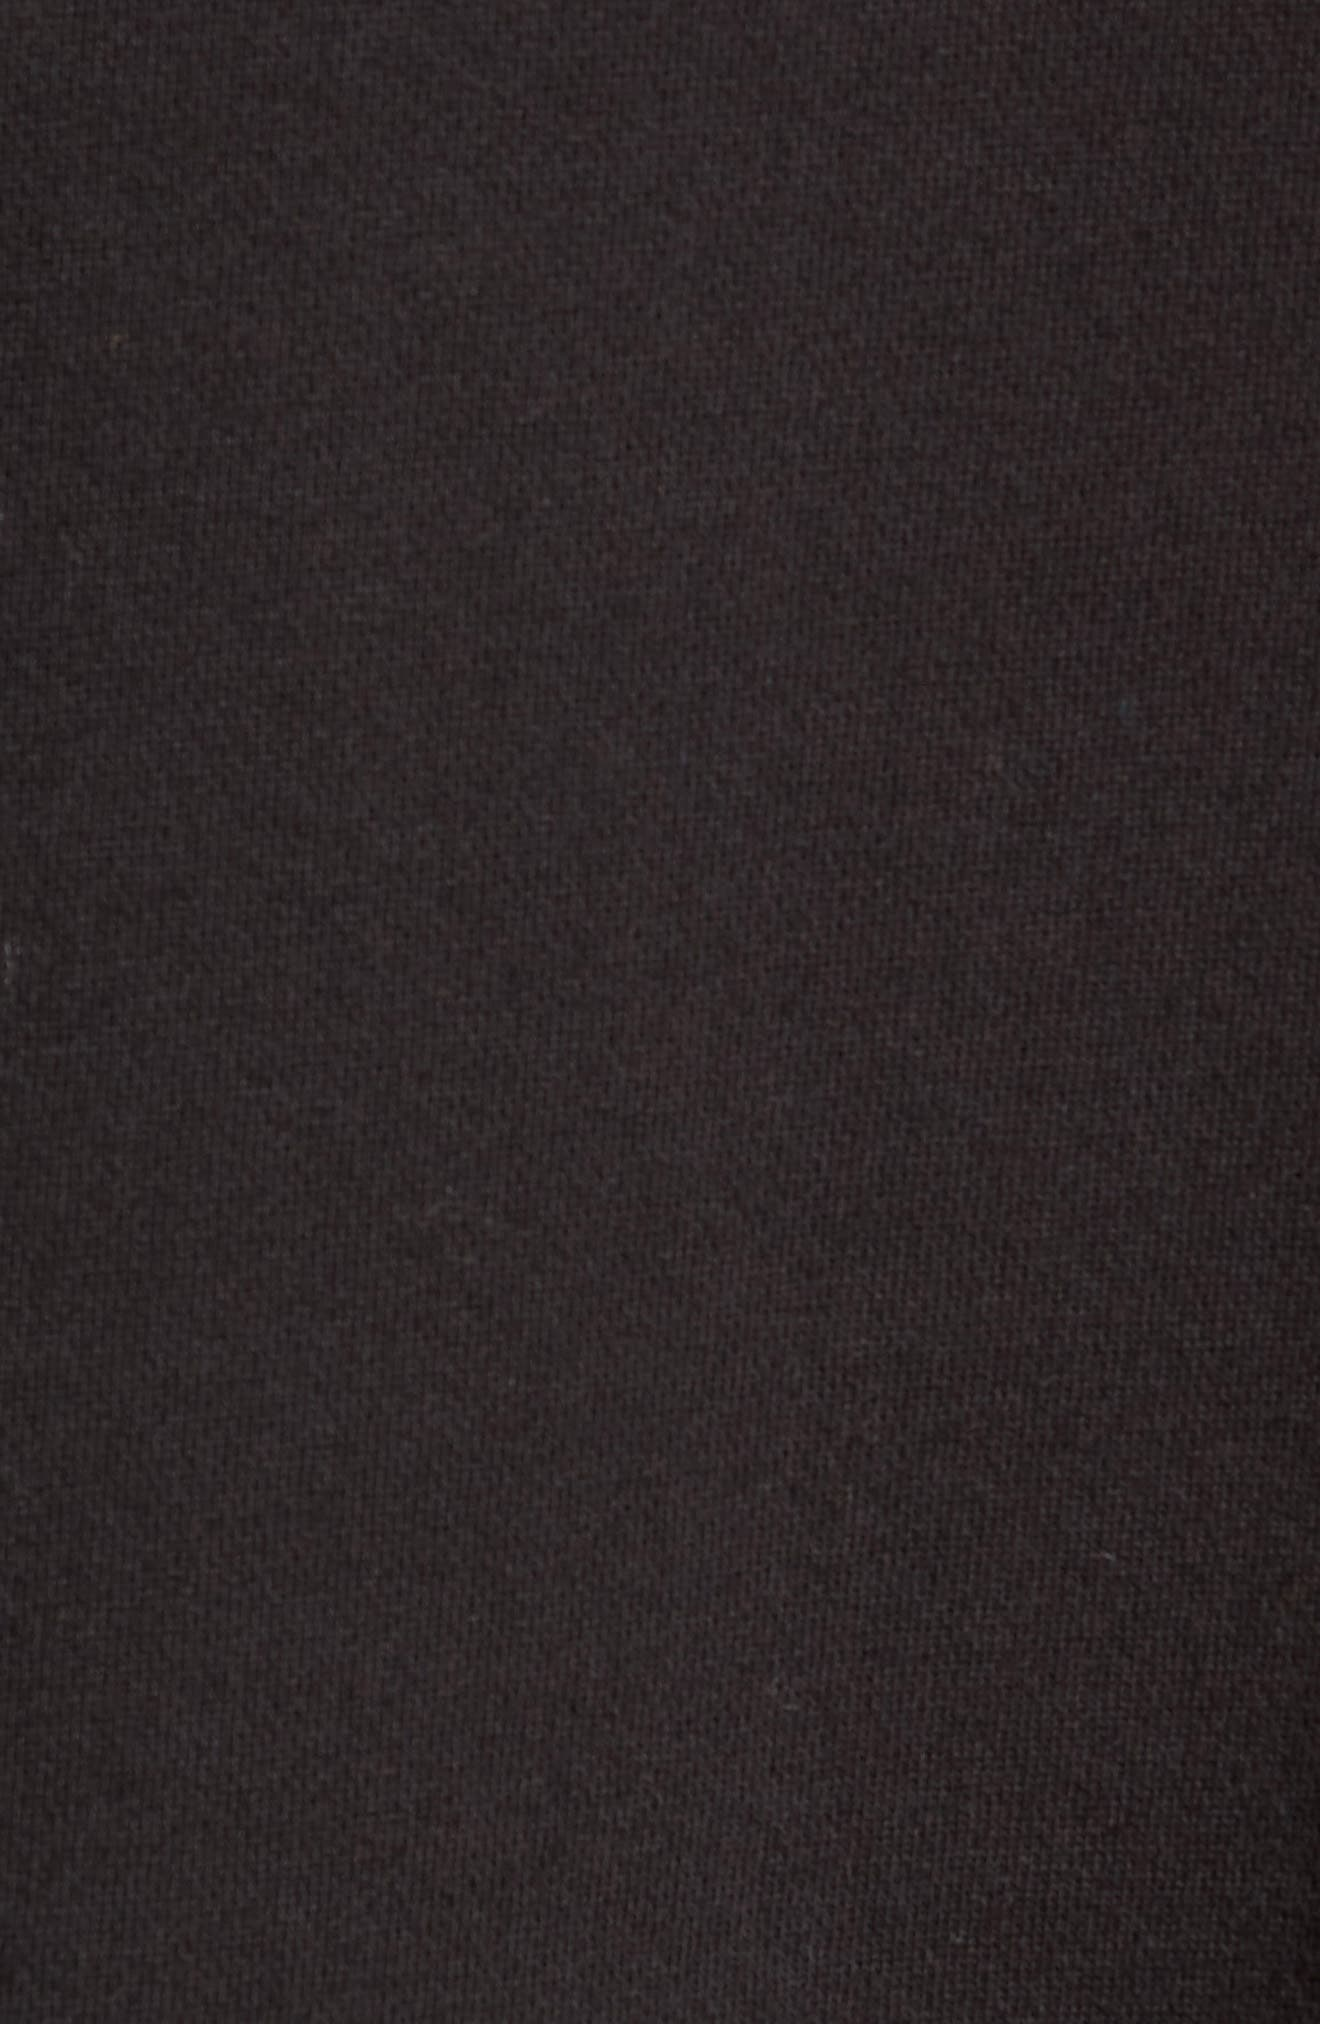 + Champion Turtleneck Sweatshirt,                             Alternate thumbnail 5, color,                             001